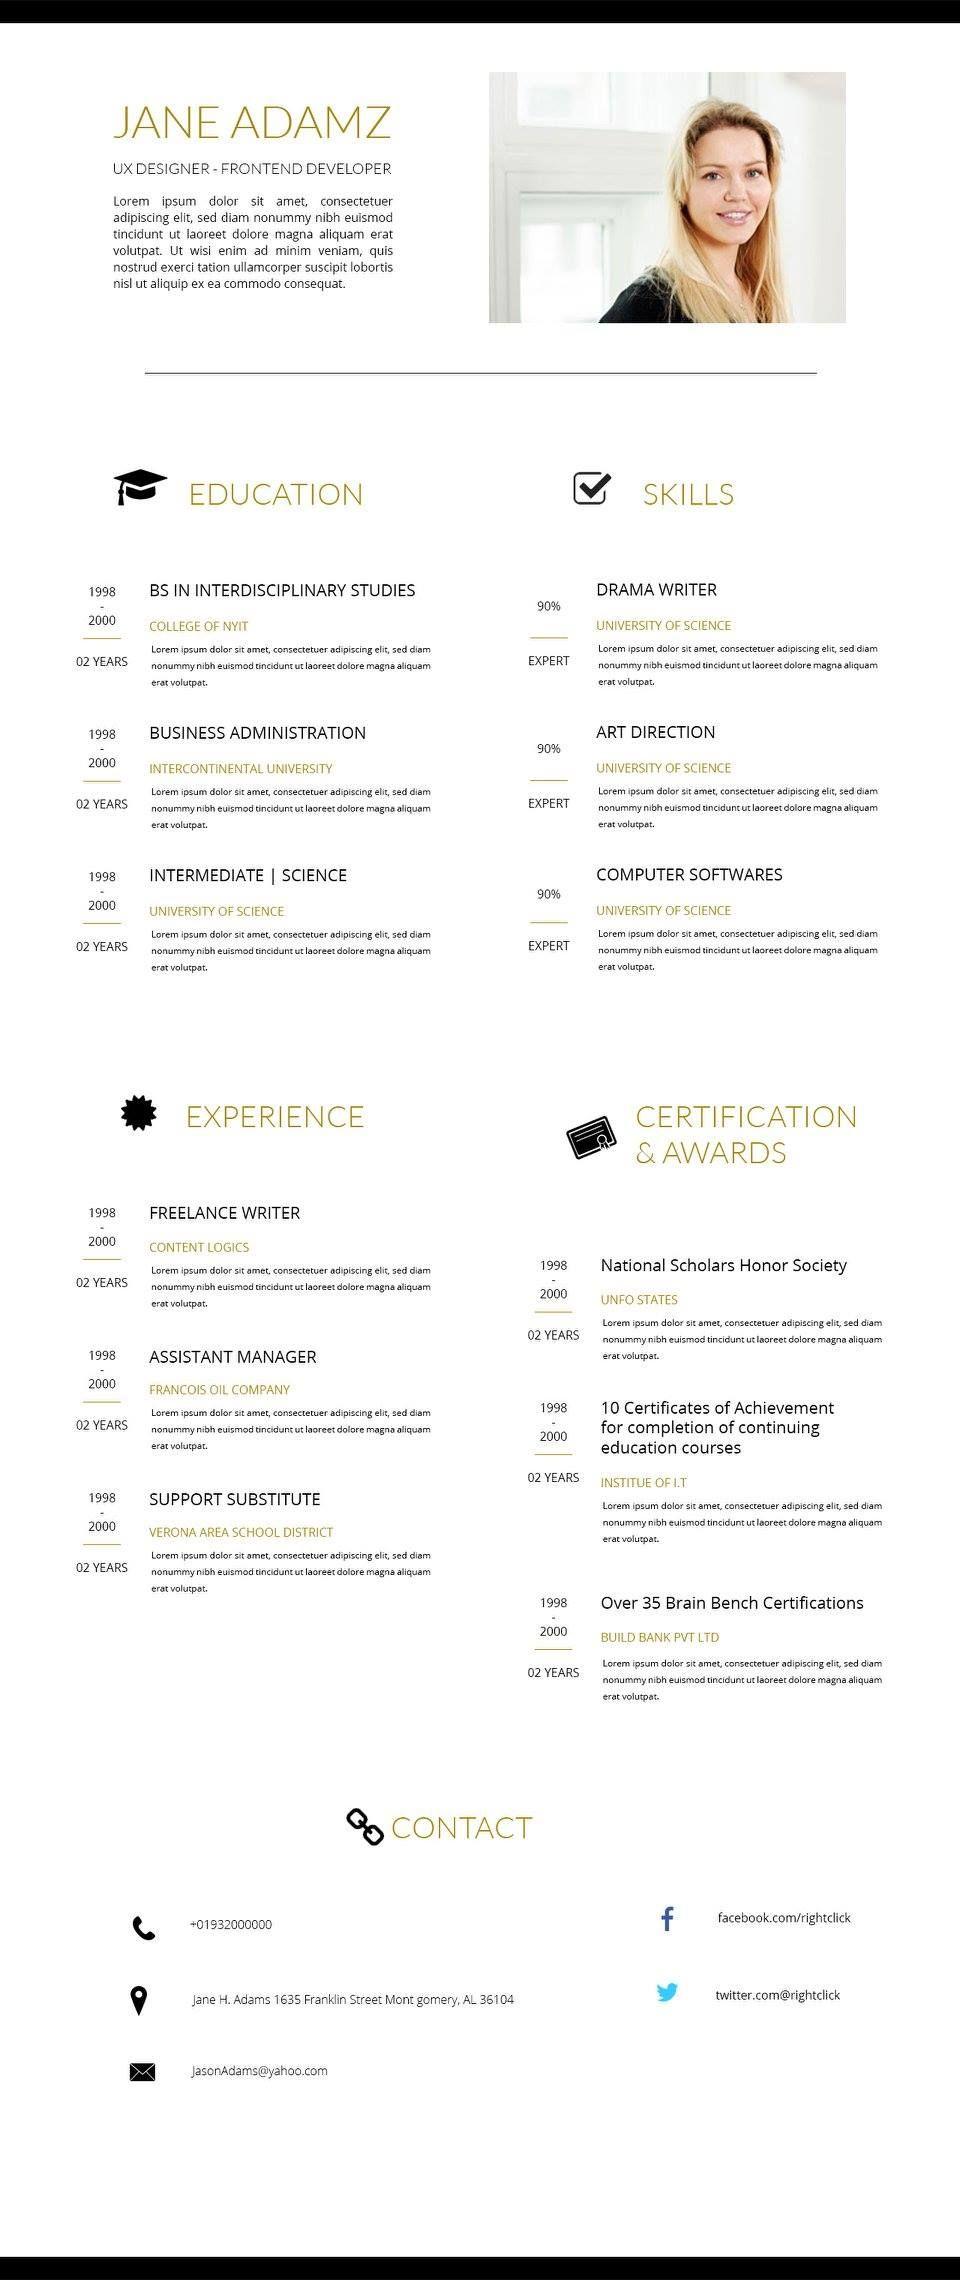 resume writing company get the best free resume writing advice